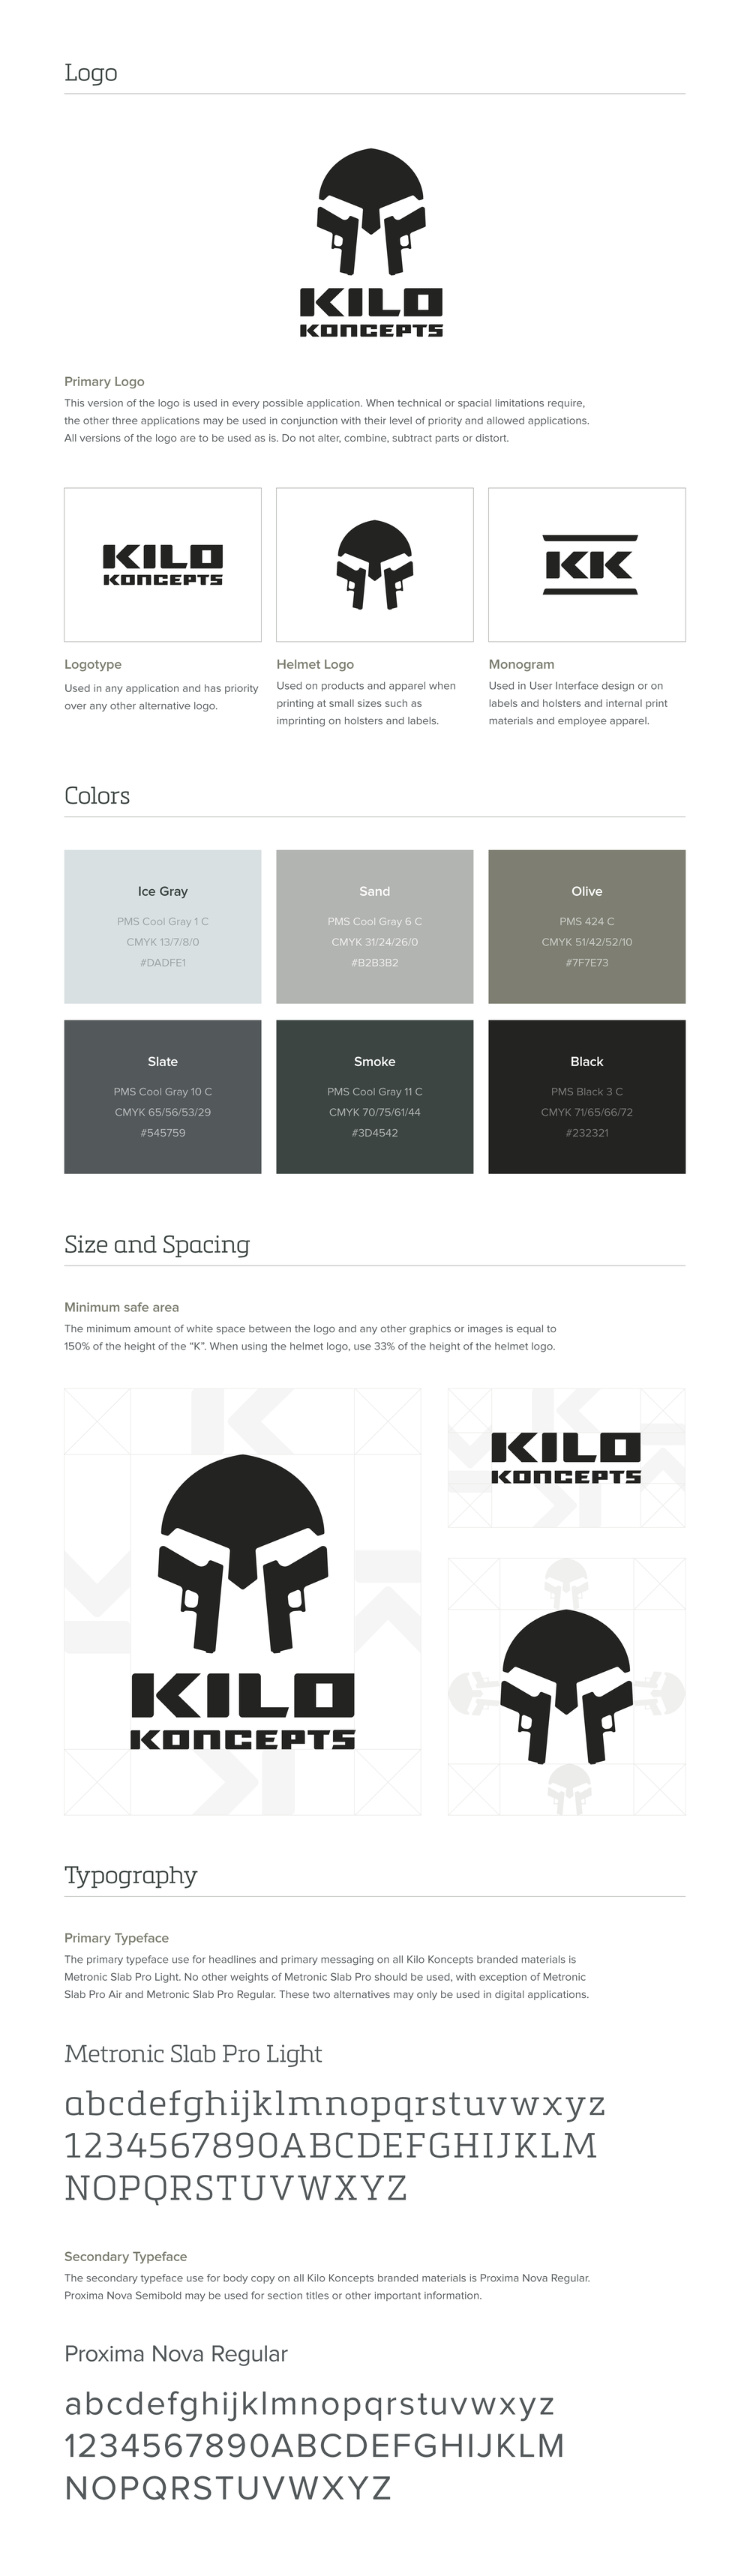 kilo_koncepts_brandsheet.jpg